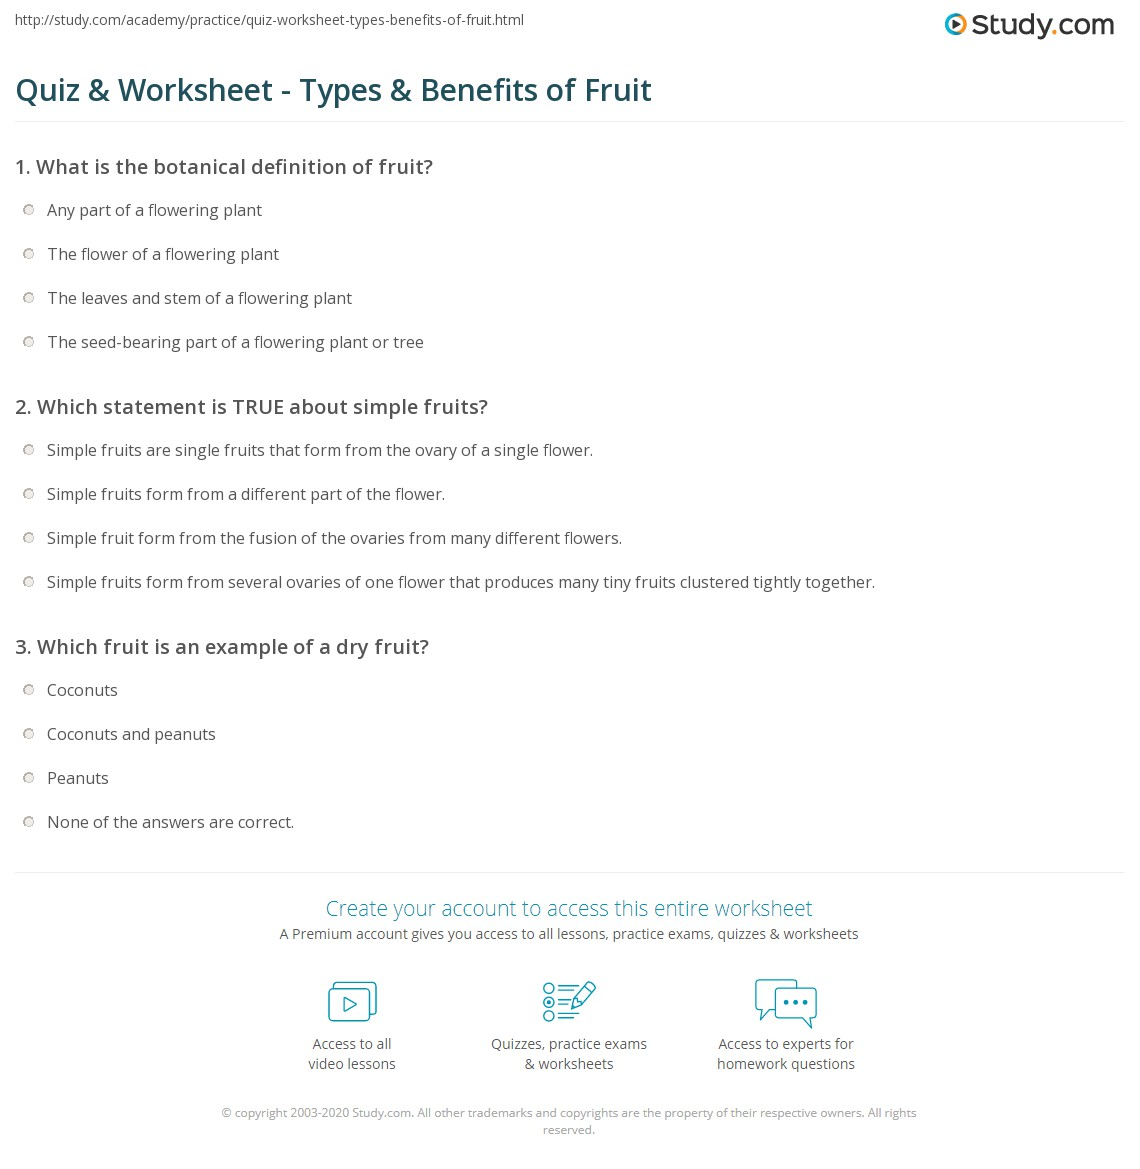 Quiz & Worksheet - Types & Benefits of Fruit | Study.com